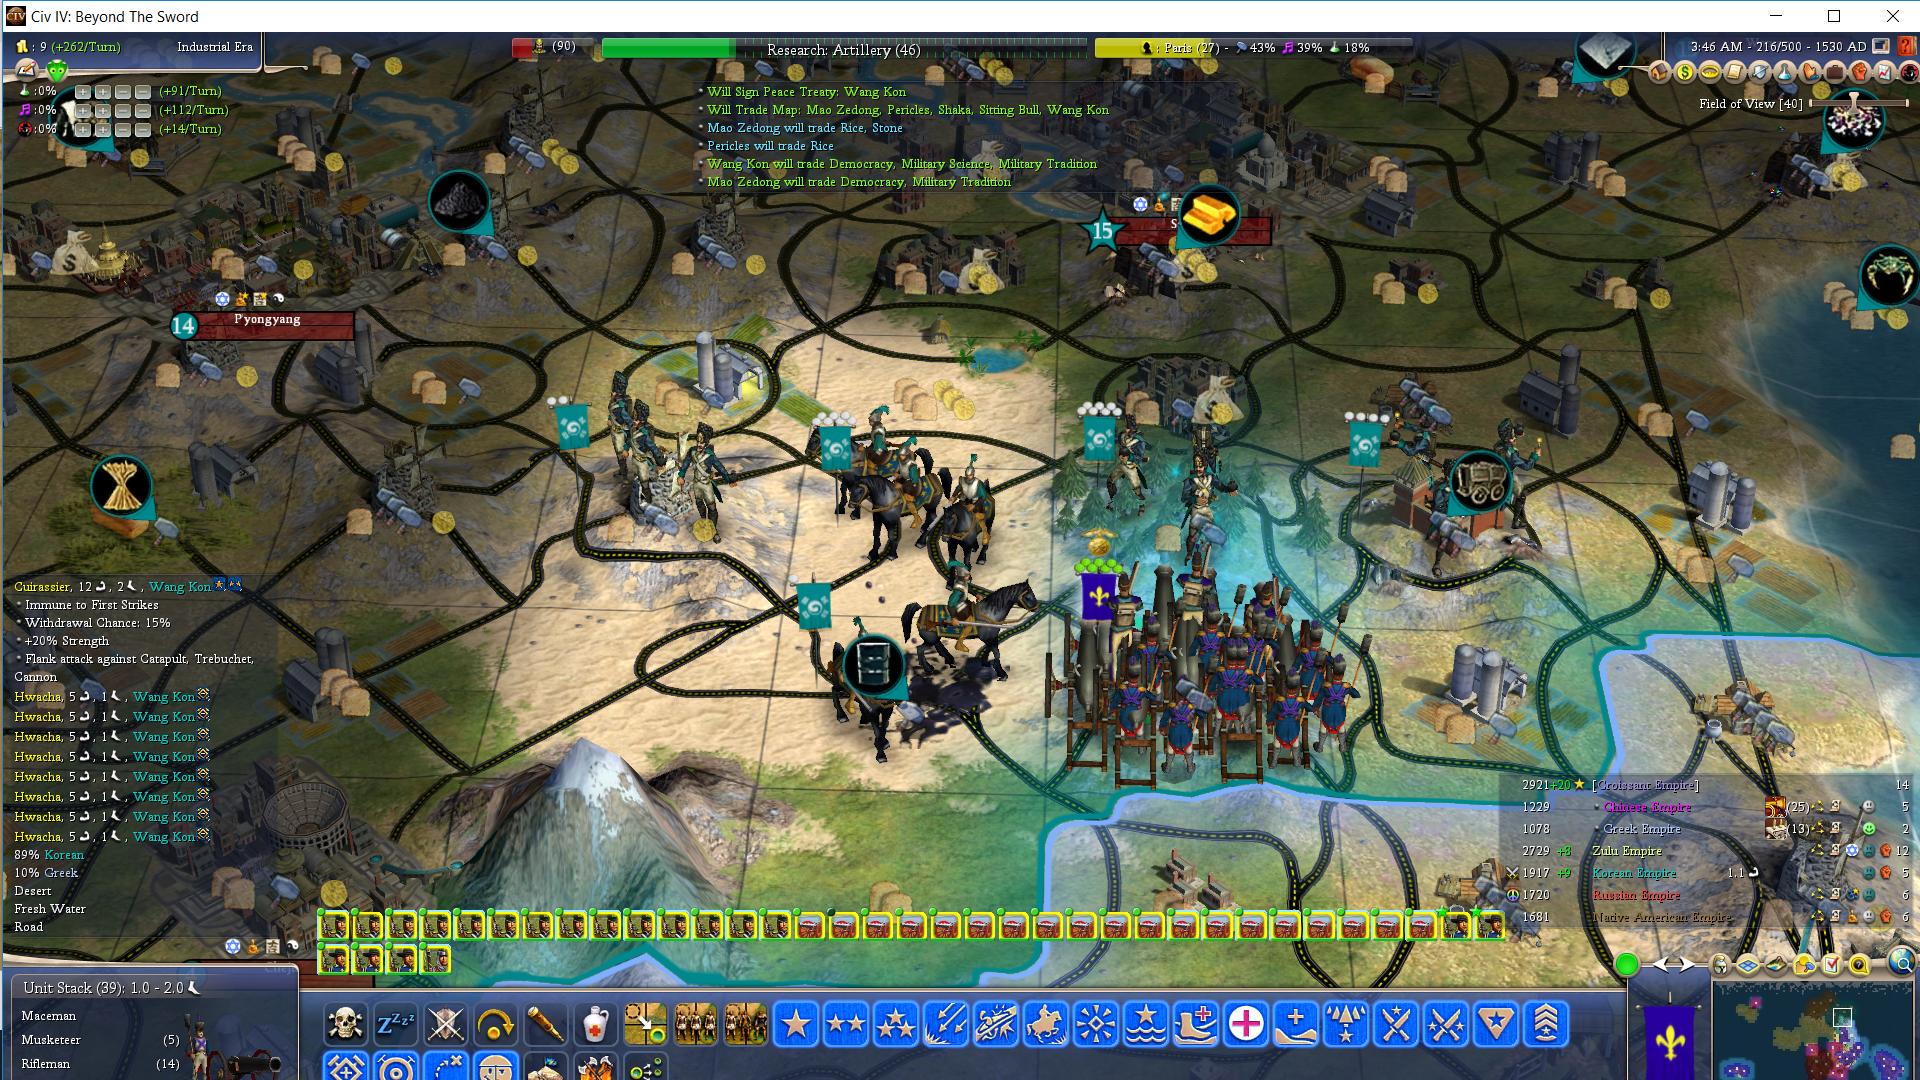 Screenshot (20070).png